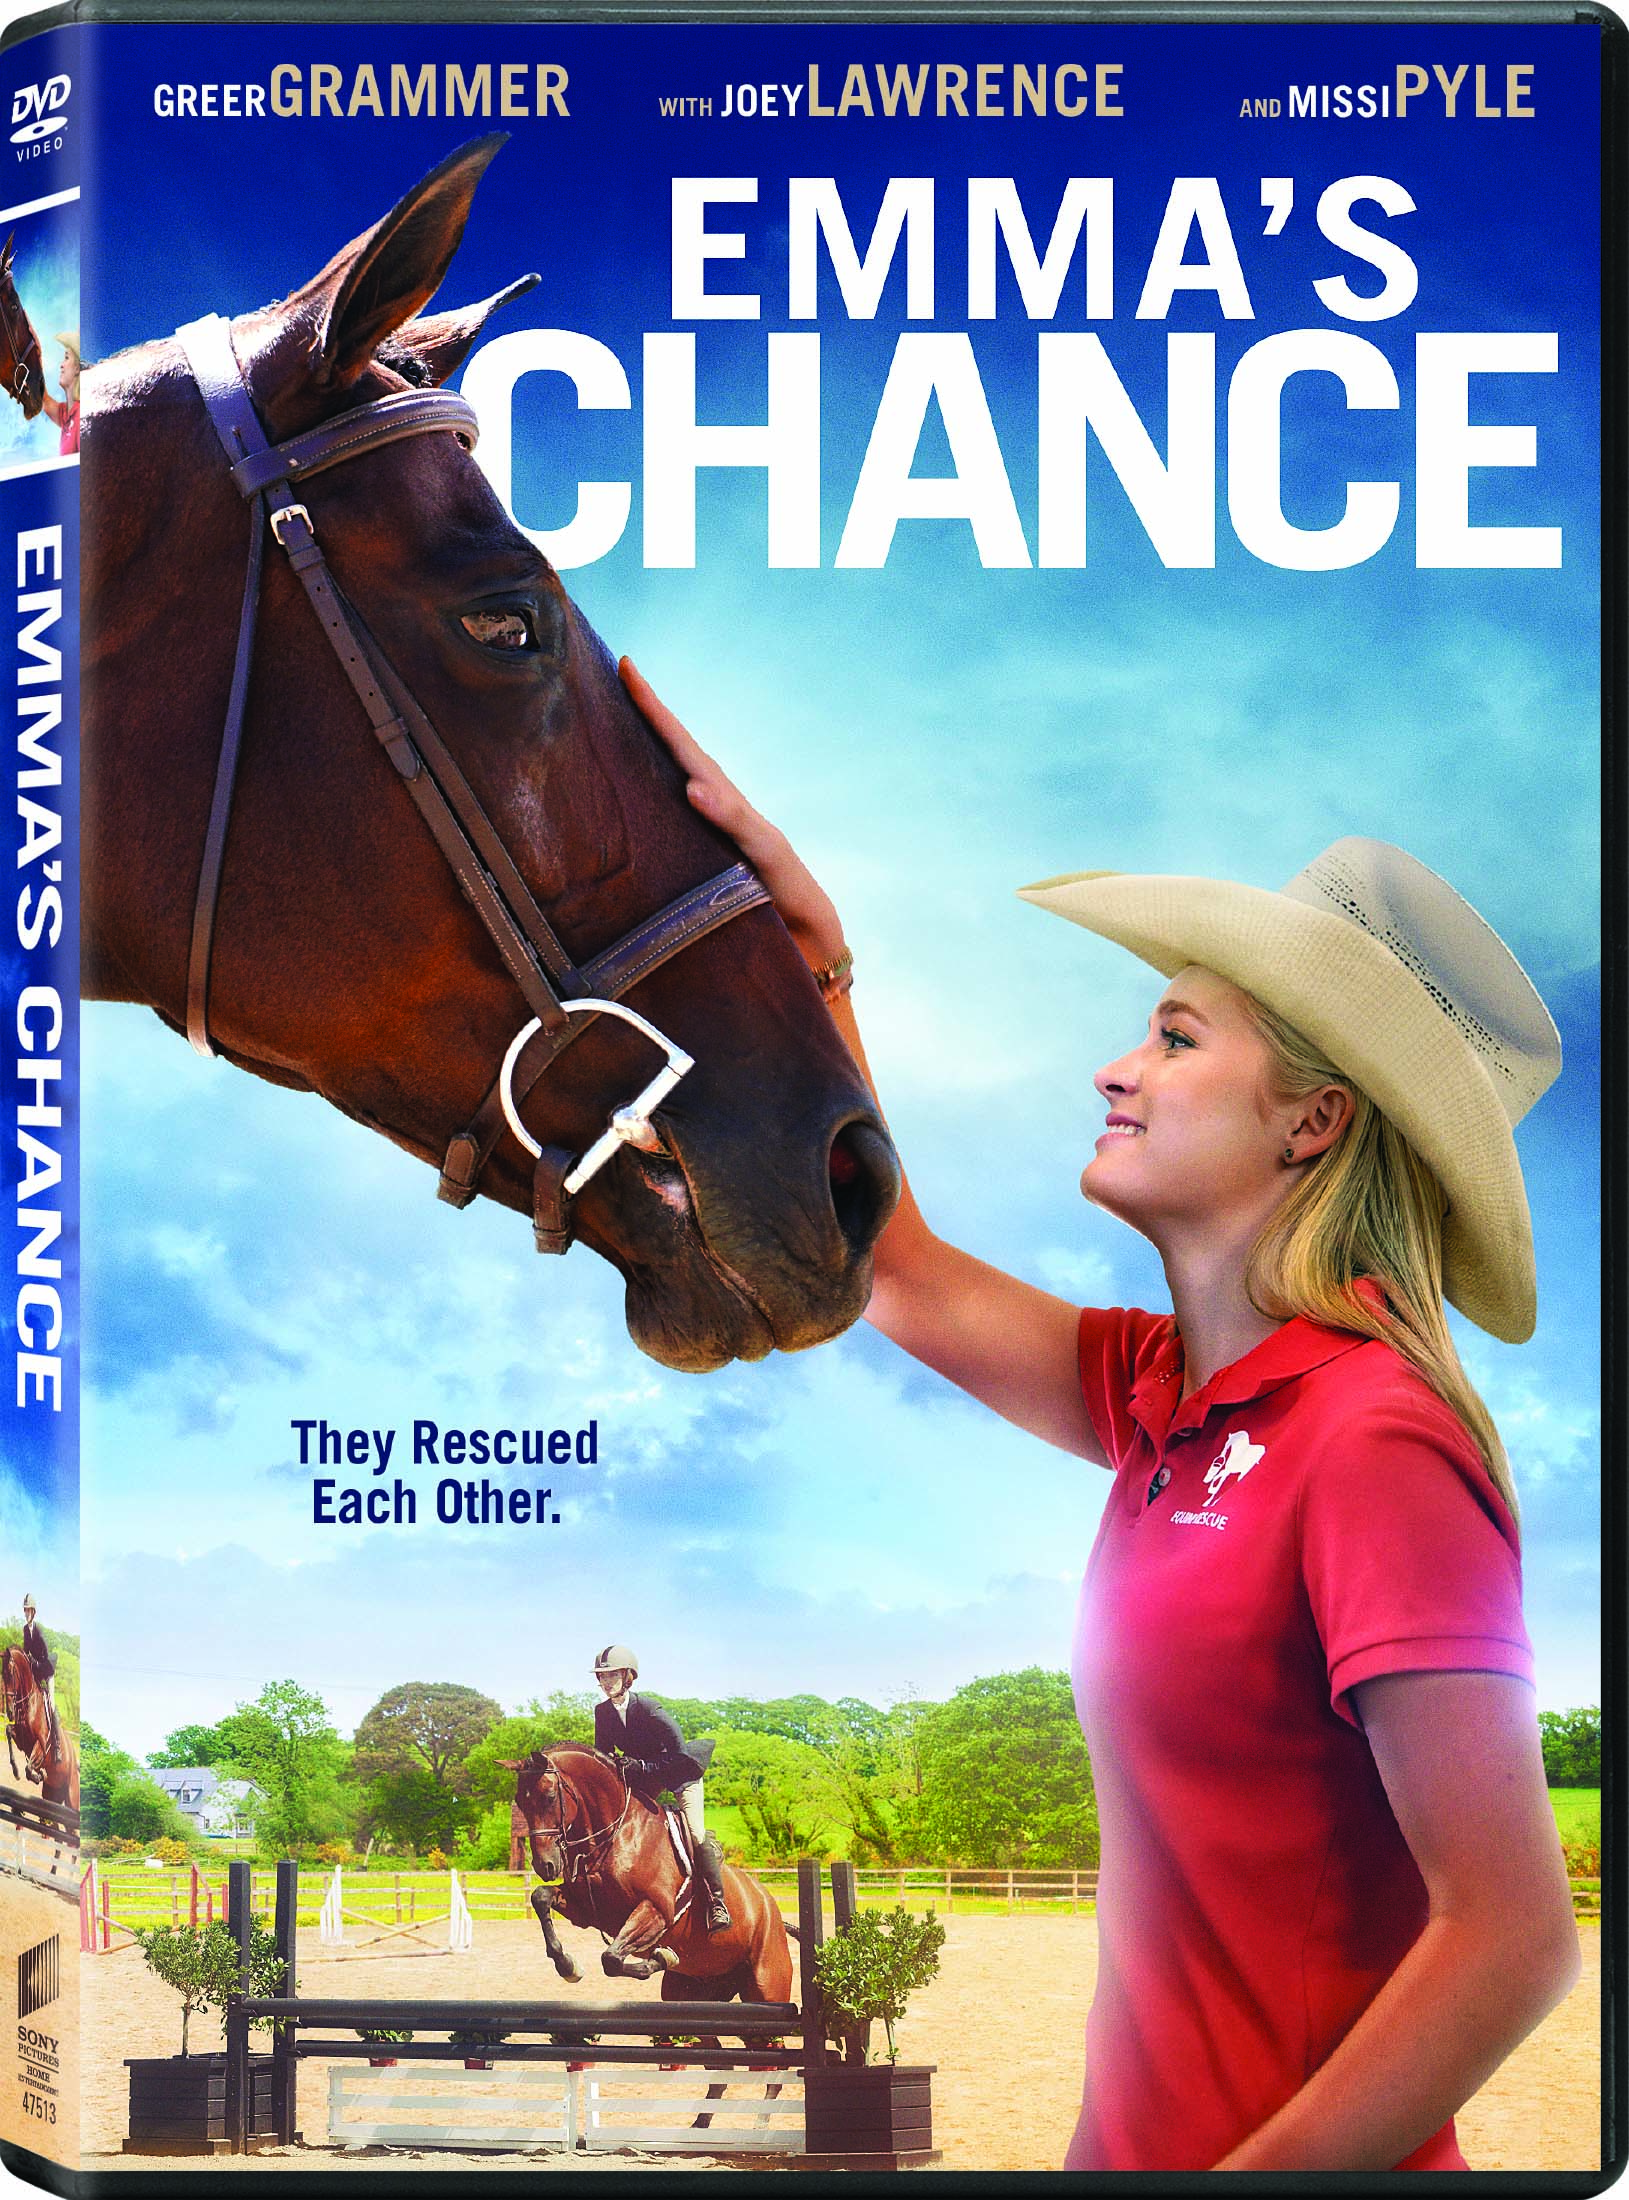 Emma's Chance on DVD July 5th